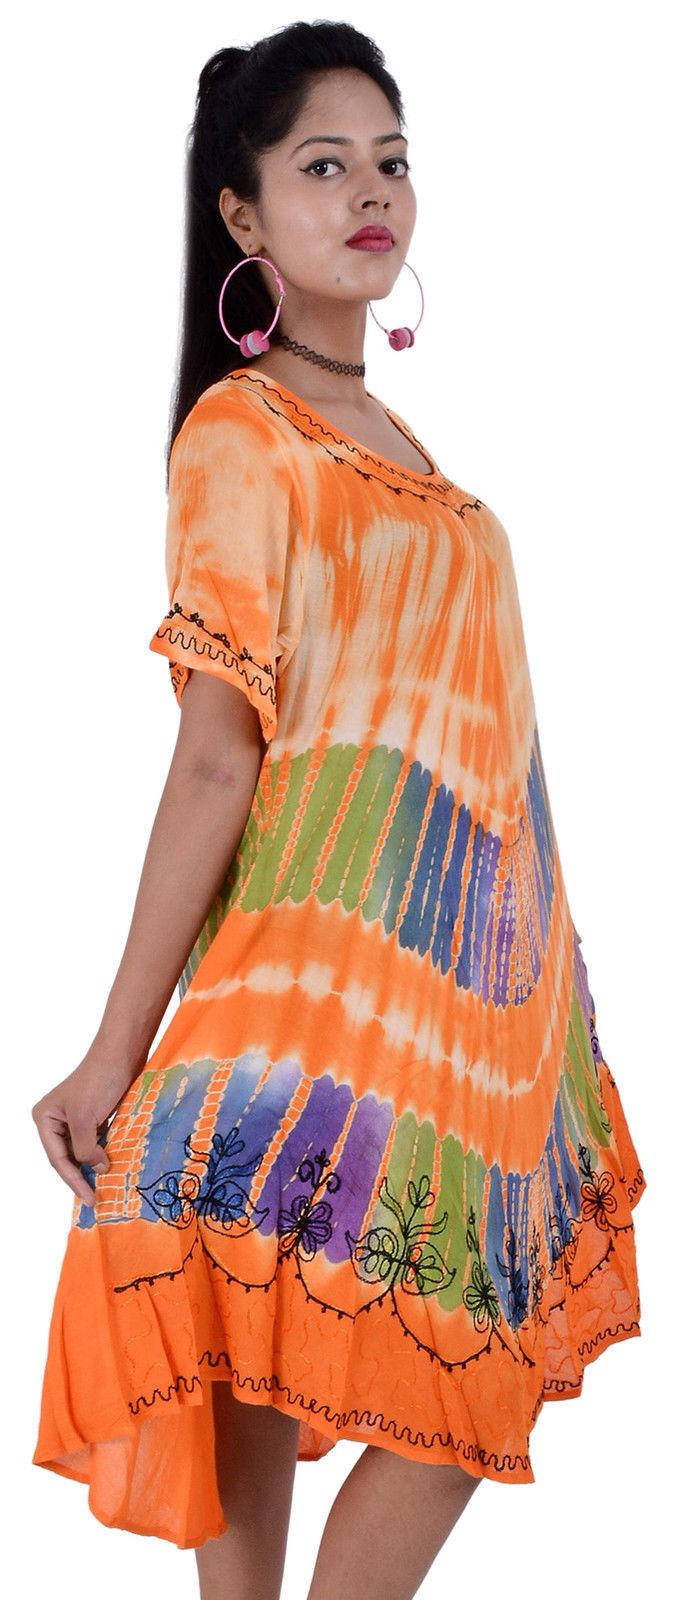 Wevez New Women's Short Sleeve Tunic Summer Dress 10 Pcs Lot